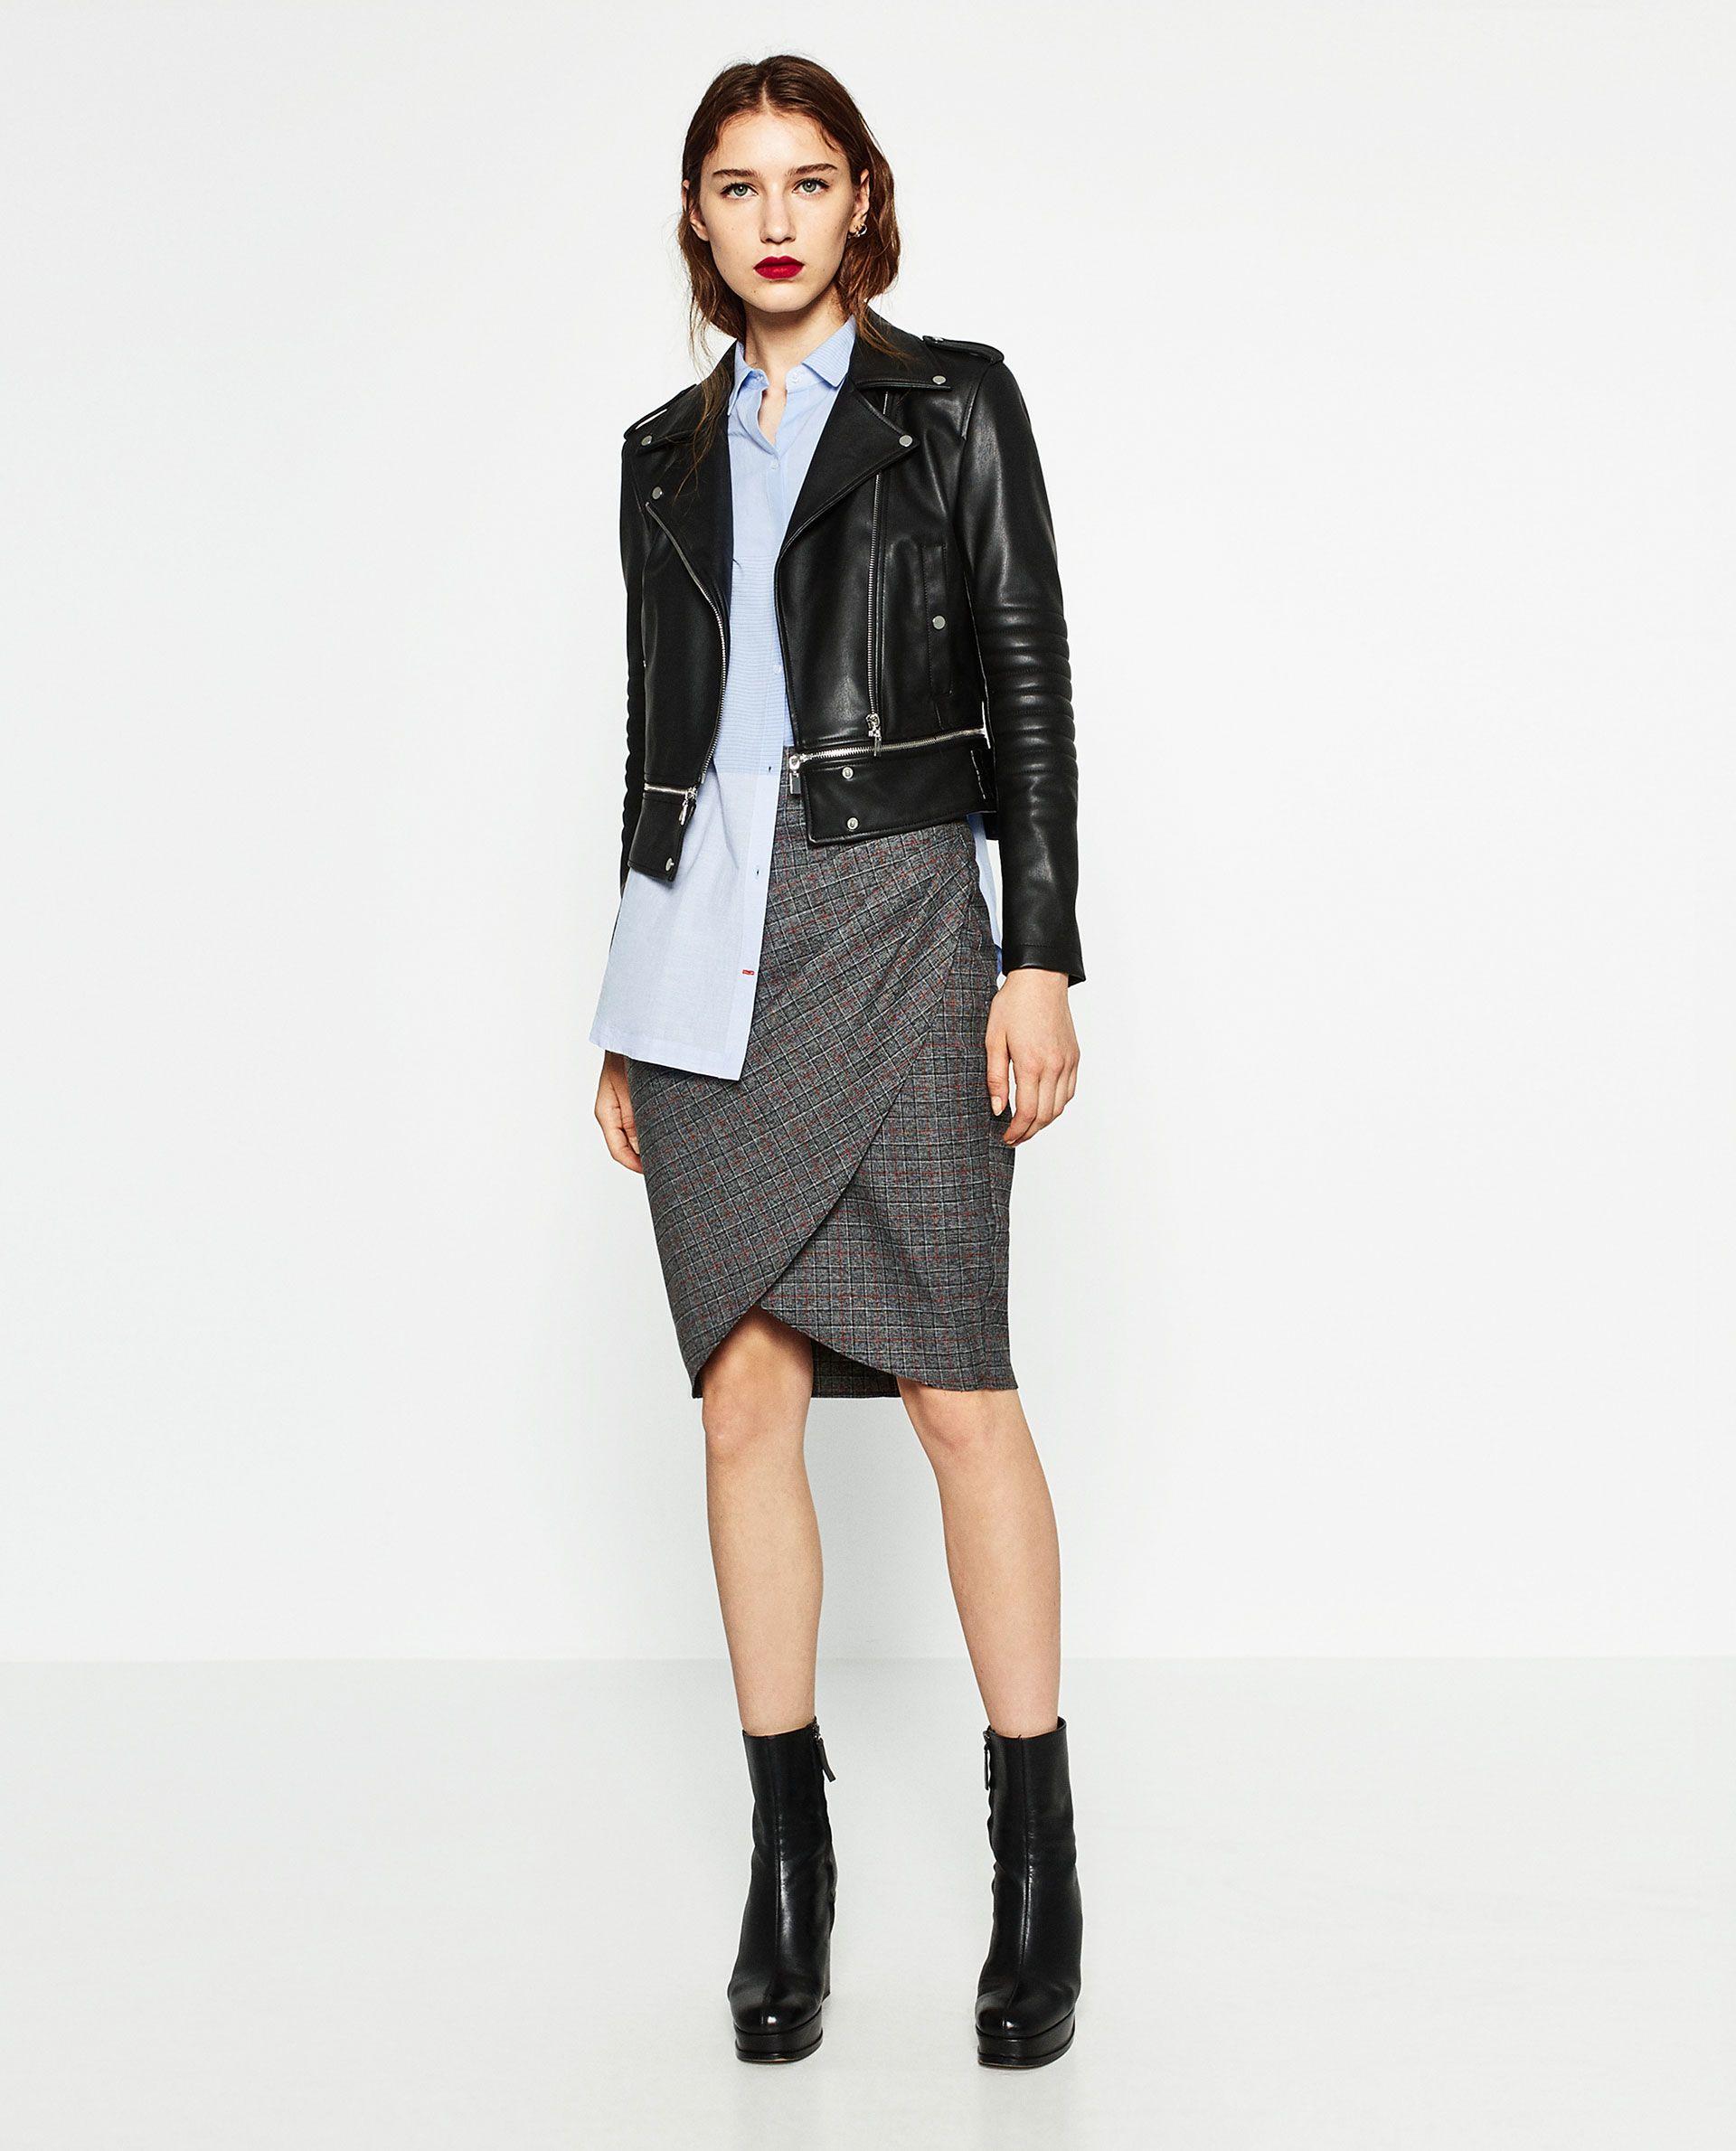 Cuir Tout Femme Effet Mode France Zara Voir Ma Manteaux Blouson gqO5xw